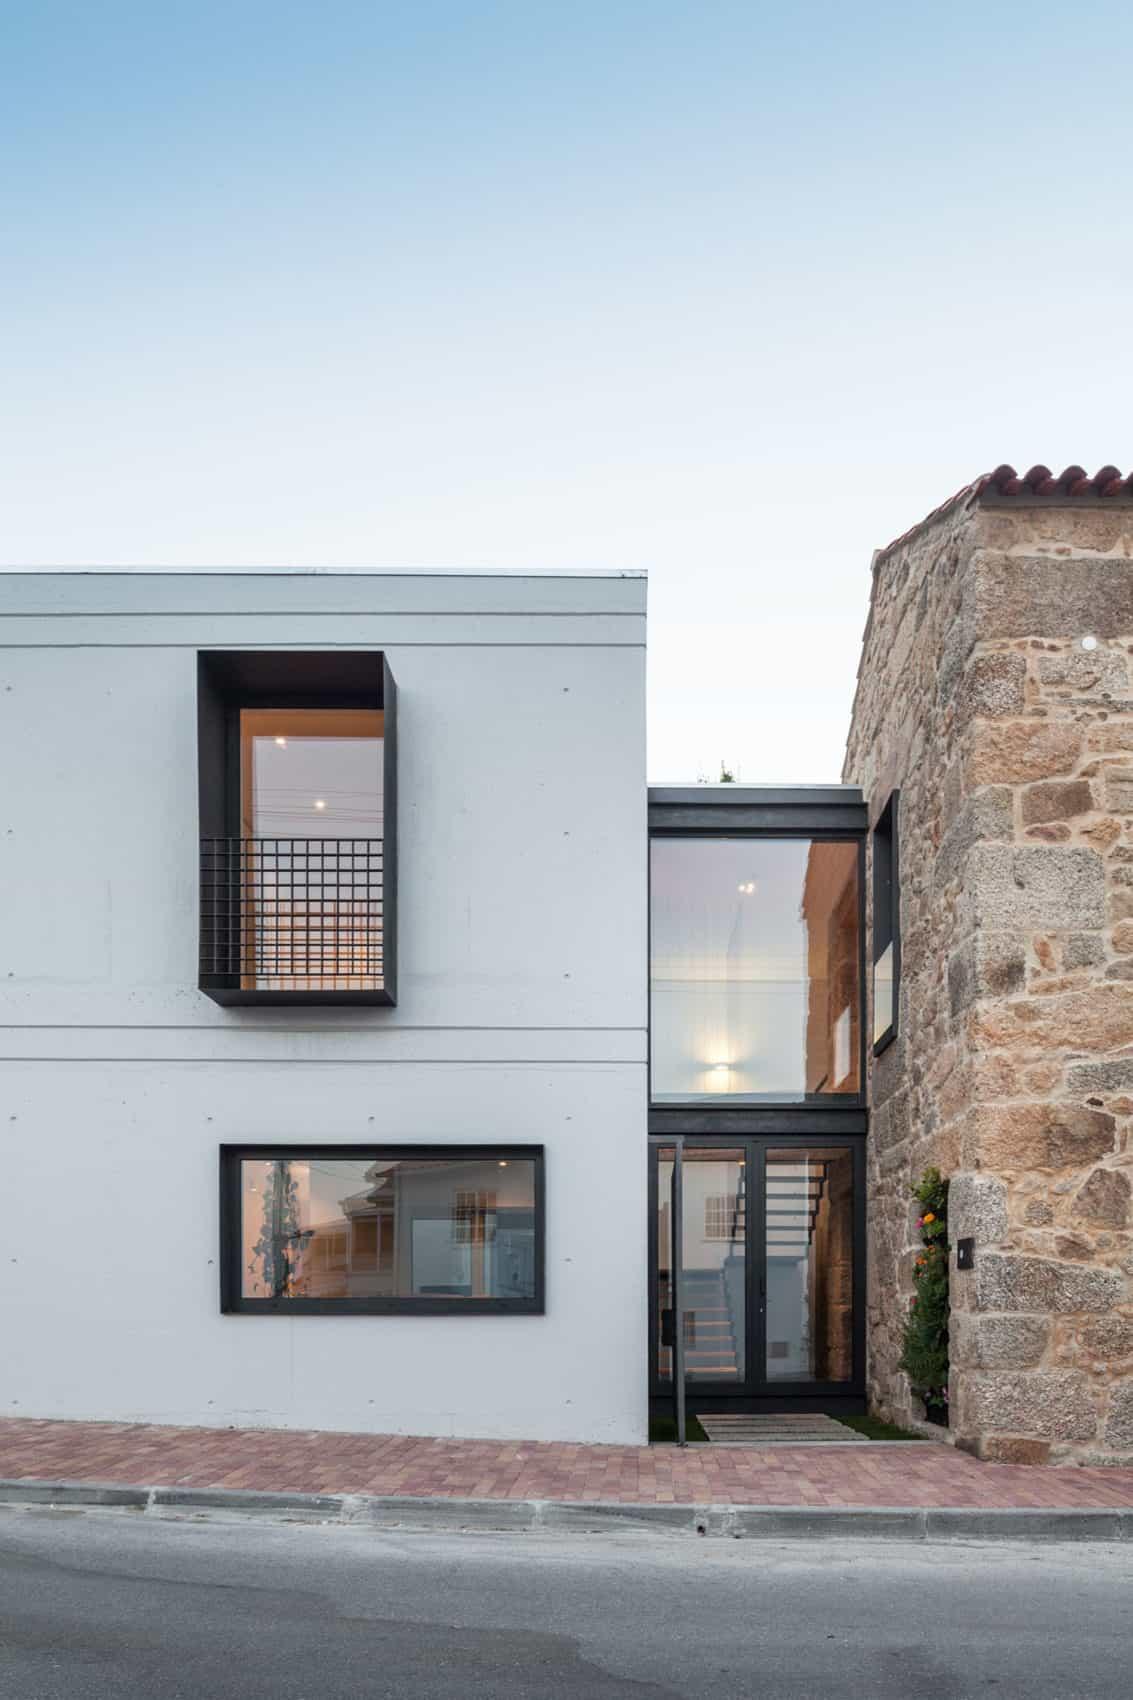 House JA by Filipe Pina & Inês Costa (5)